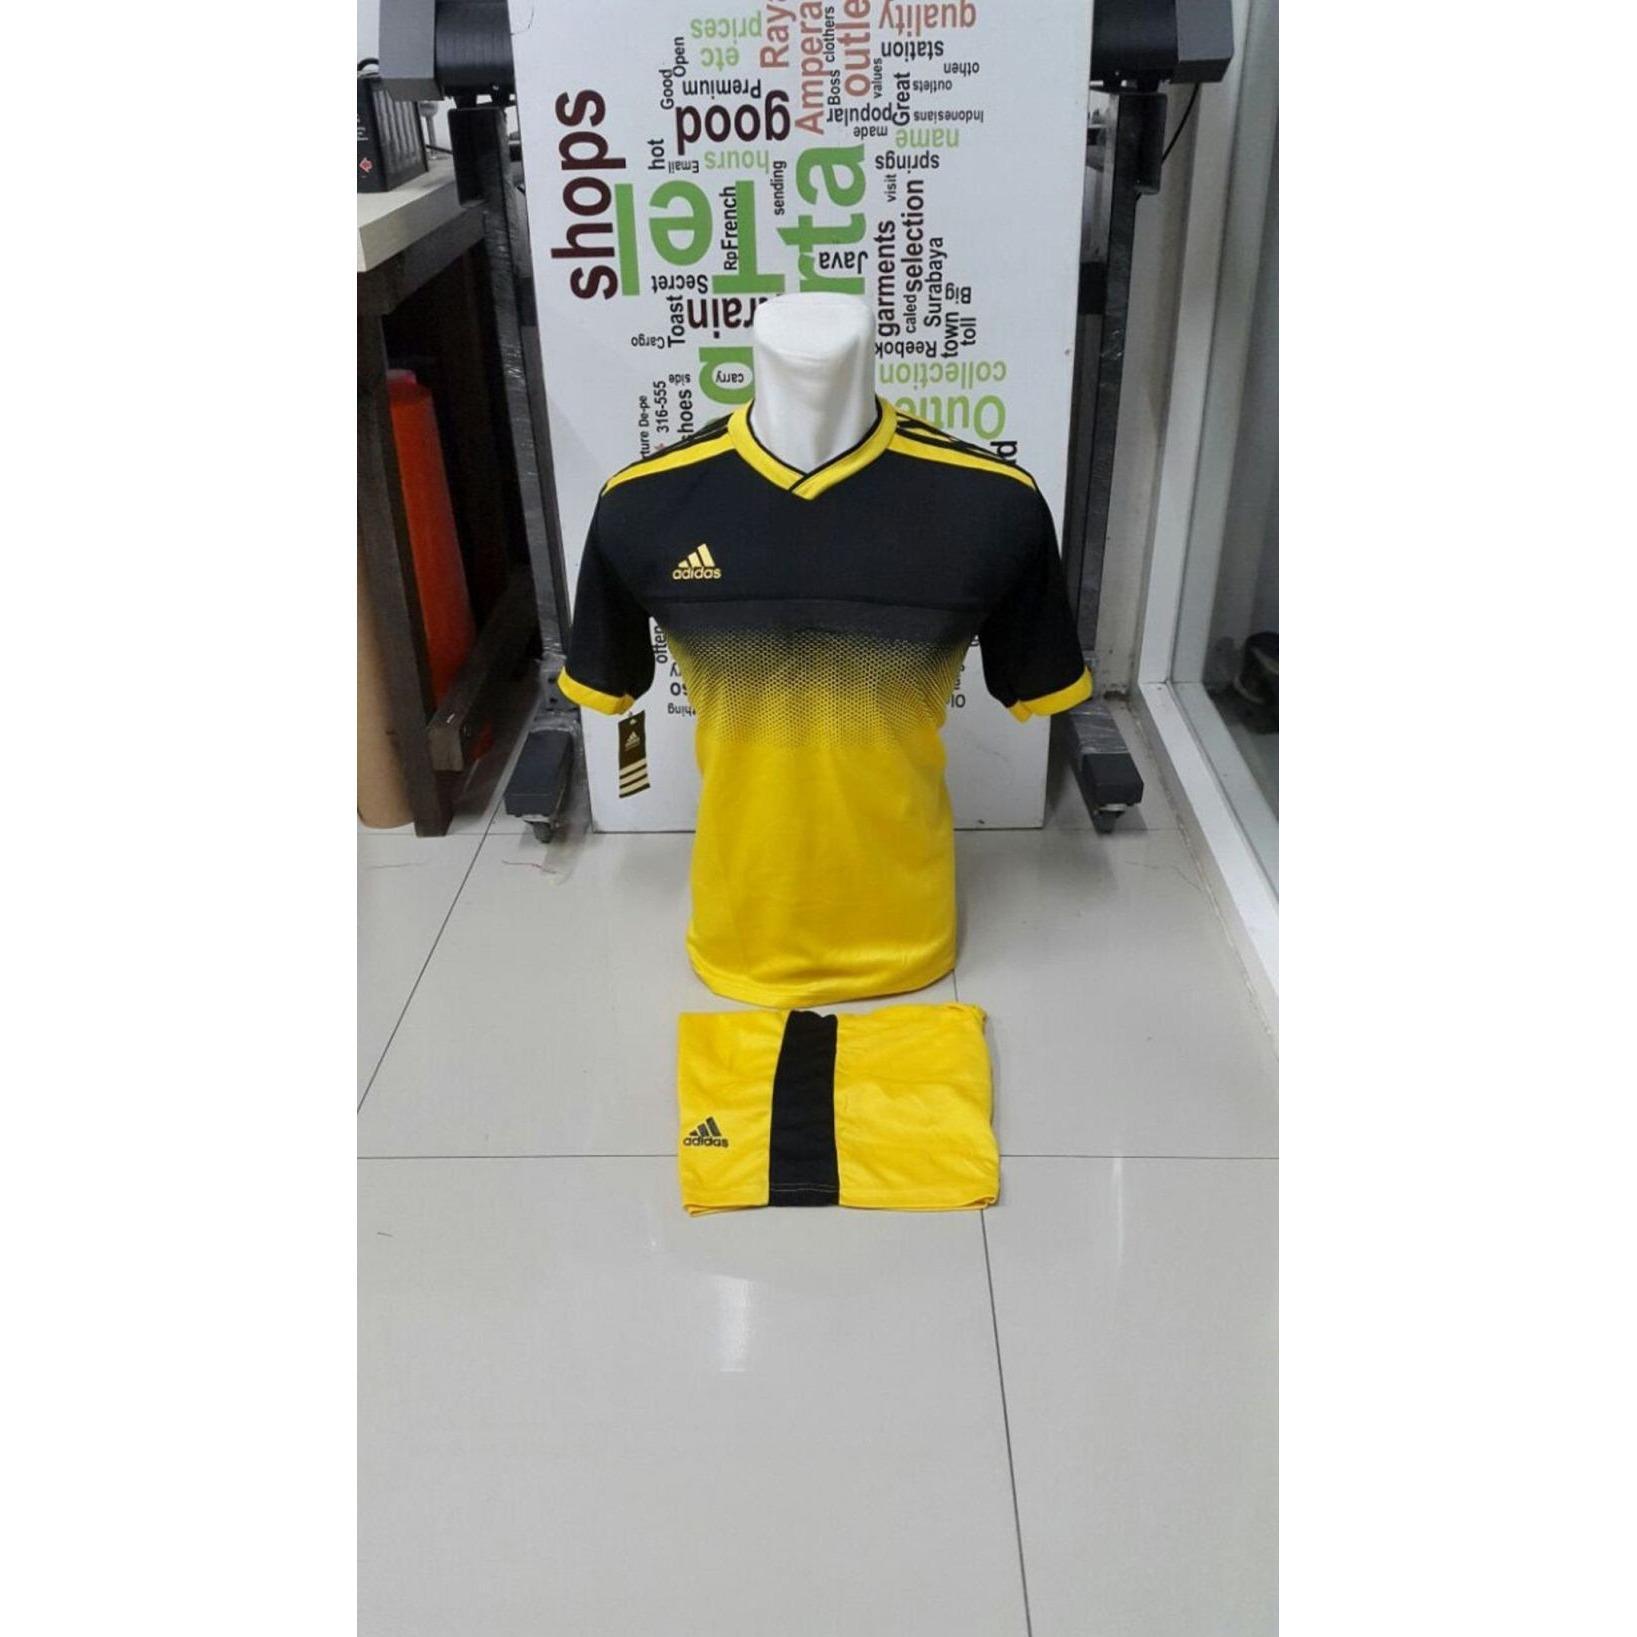 Kostum Kaos Sepakbola Futsal Volly Takraw Bahan Dryfit M L XL Hijau/Merah/Biru/Kuning Hitam Plus Celana Pendek 24.48